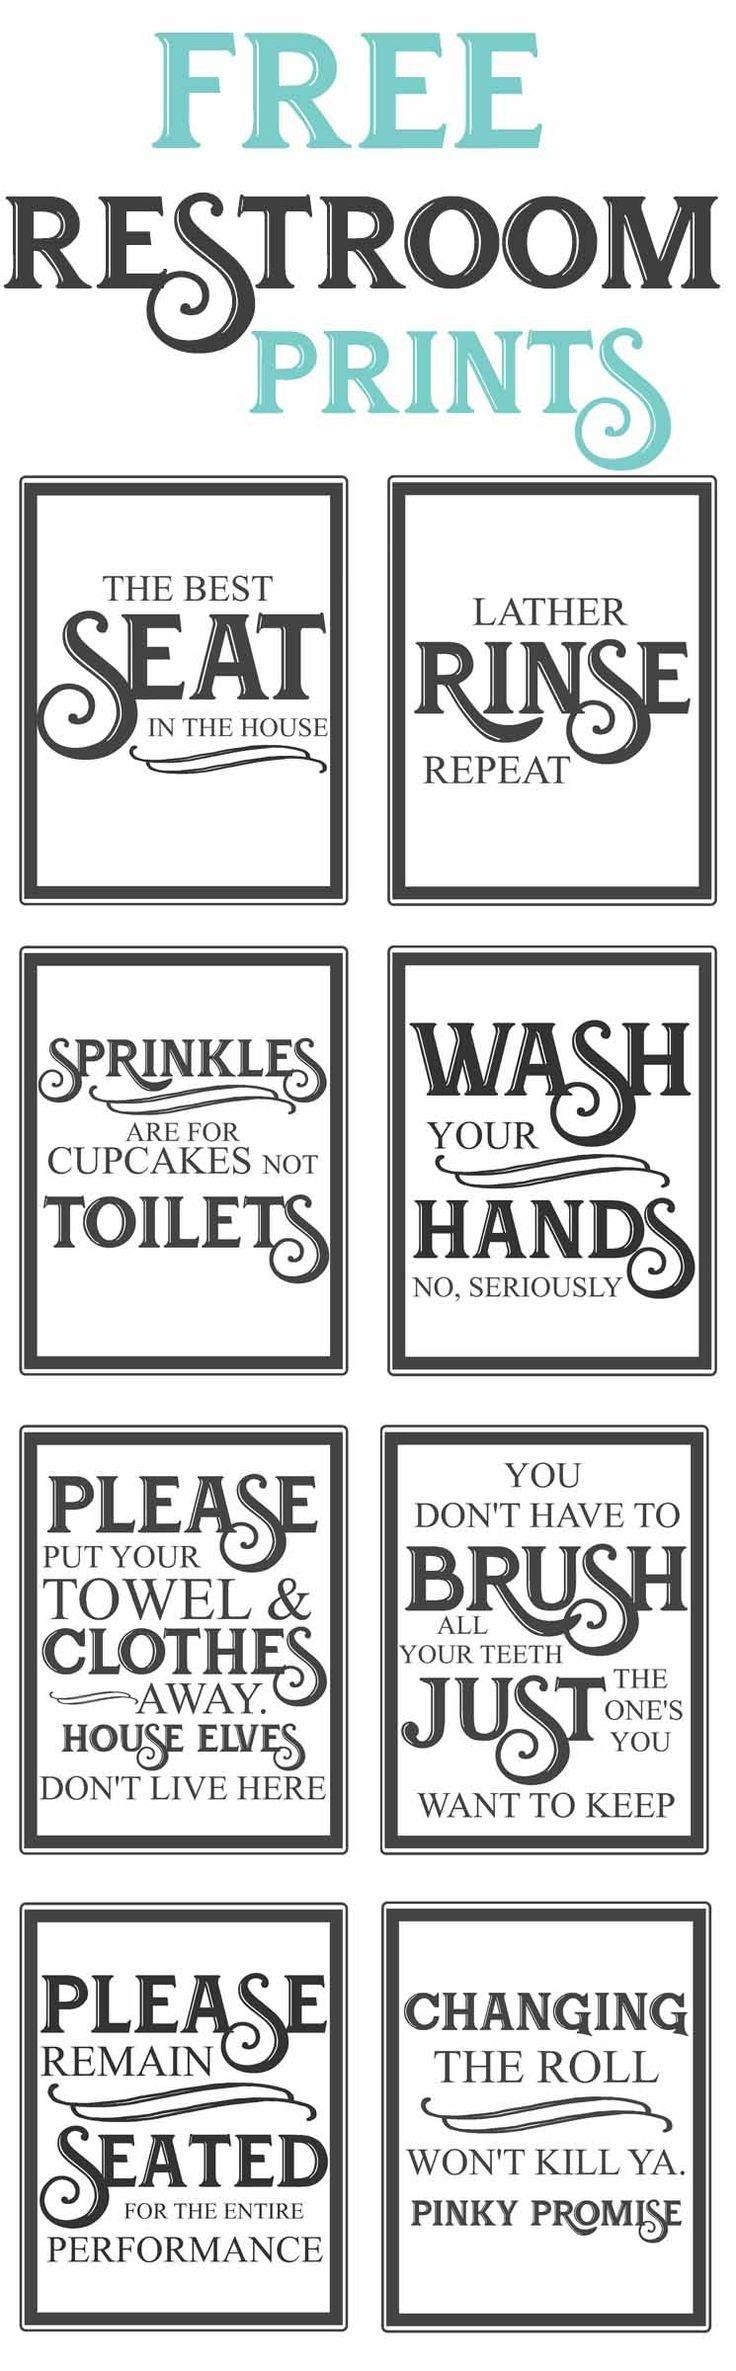 Free Vintage Bathroom Printables | Farmhouse | Diy Home Decor, Home - Free Printable Flush The Toilet Signs